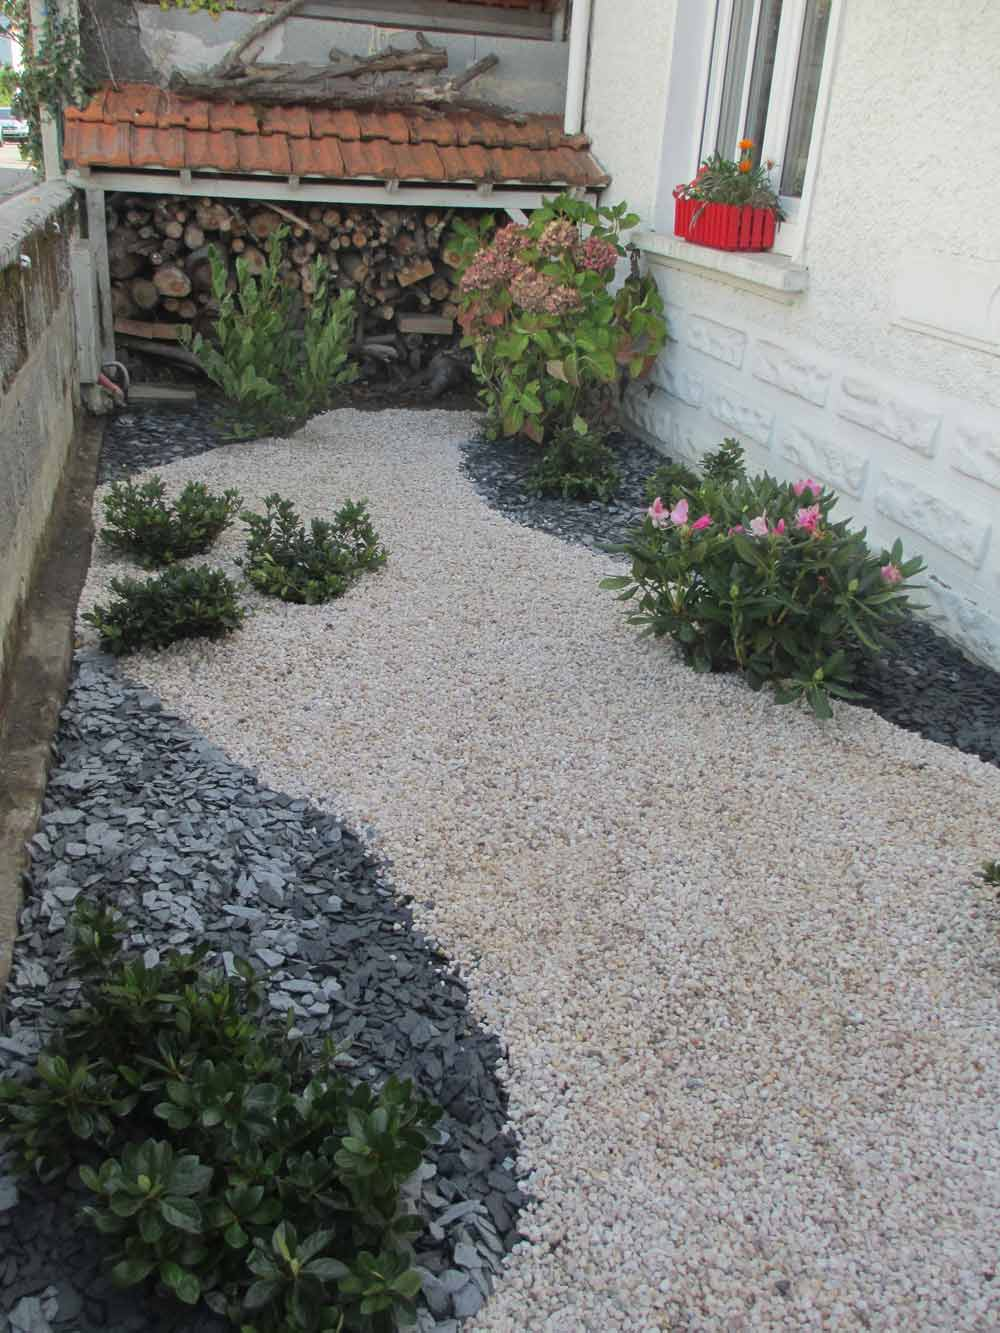 Adj espaces verts paysagiste saint mars de coutais - Creation jardin mediterraneen saint paul ...